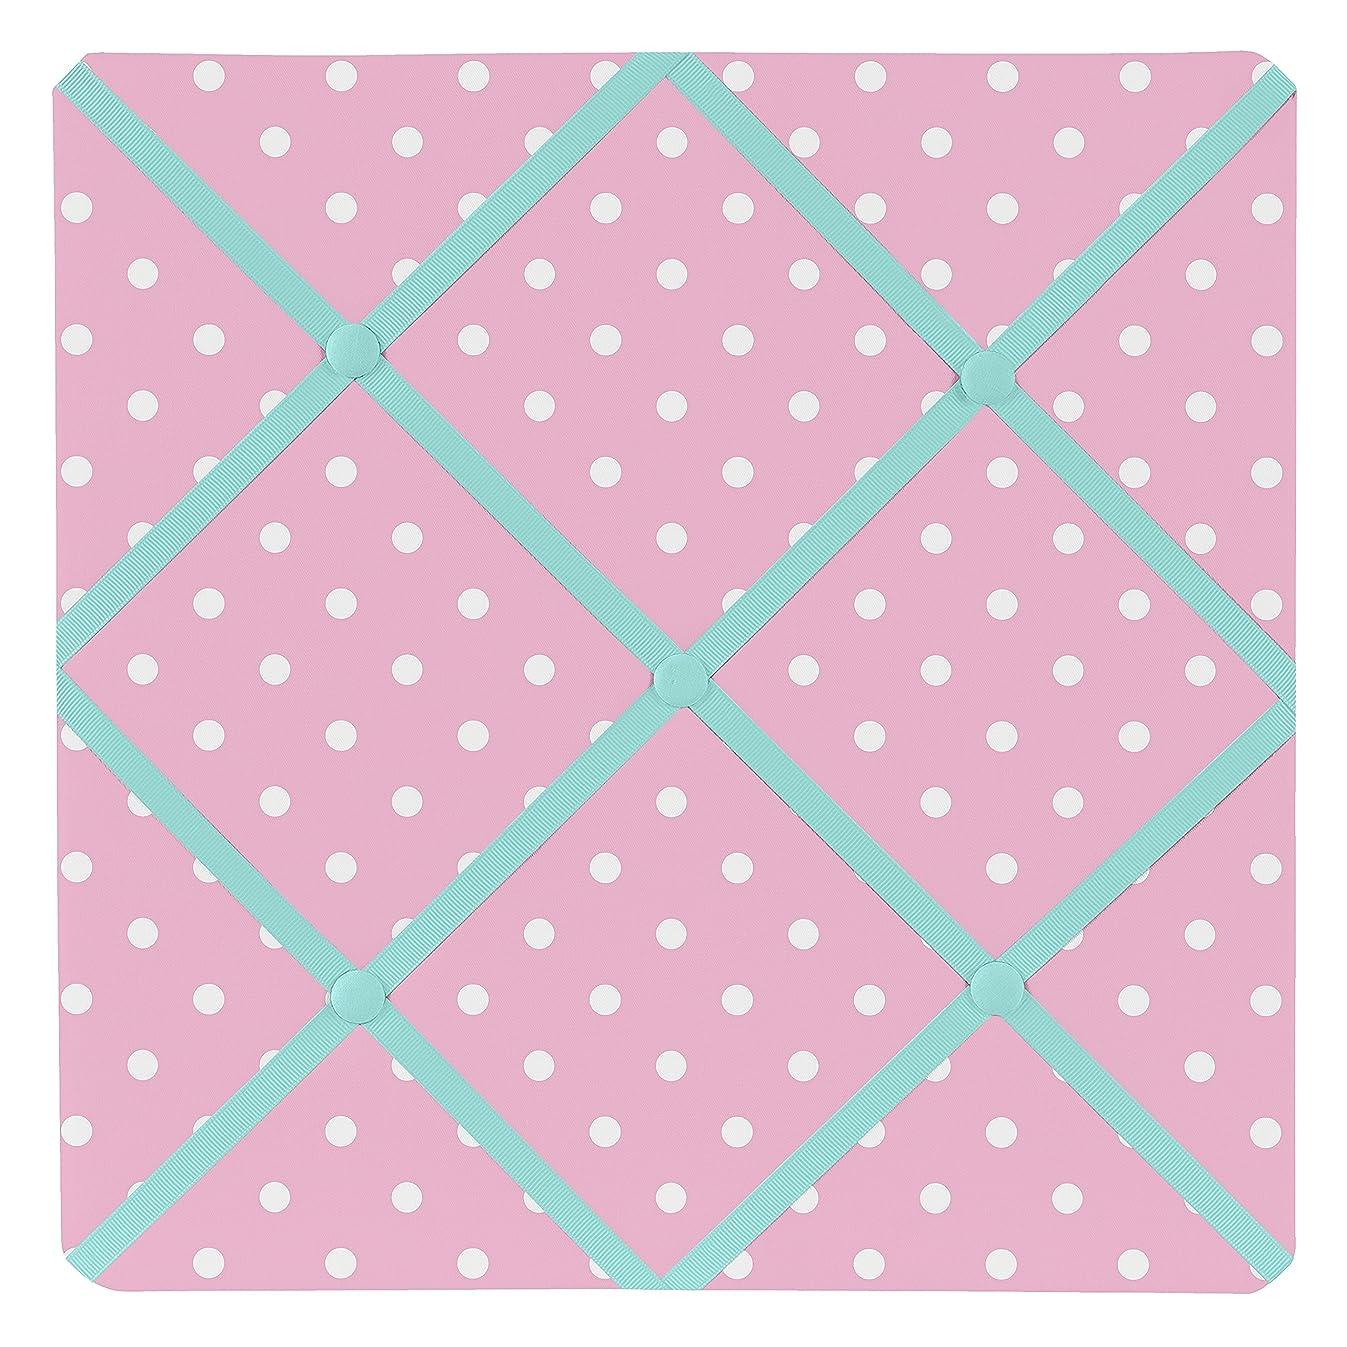 Sweet Jojo Designs Pink Polka Dot and Turquoise Skylar Fabric Memory/Memo Photo Bulletin Board